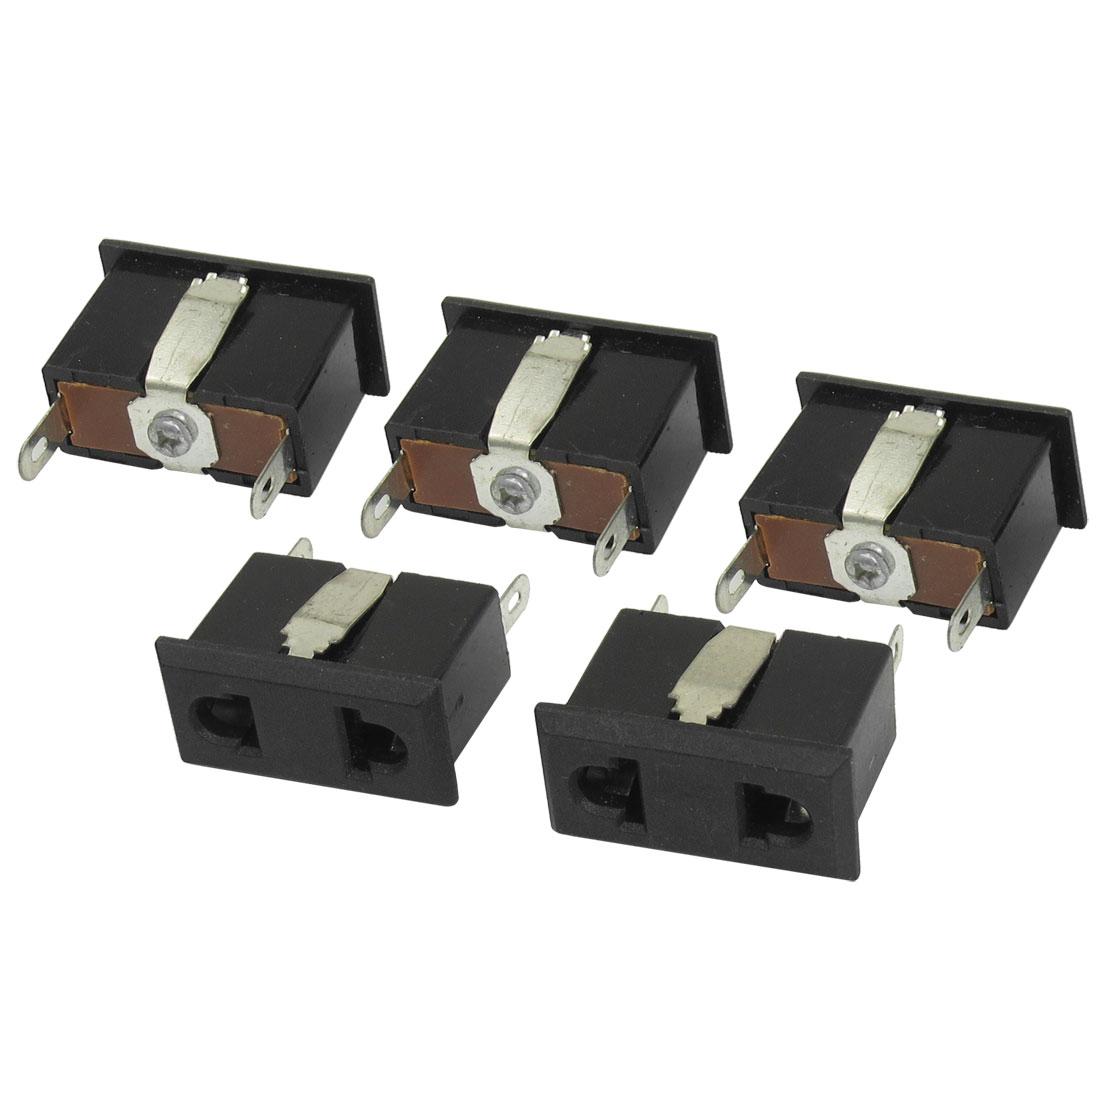 5 Pcs AU Australia Plug AC Power Converter Socket Adapters 125V/250V 6A